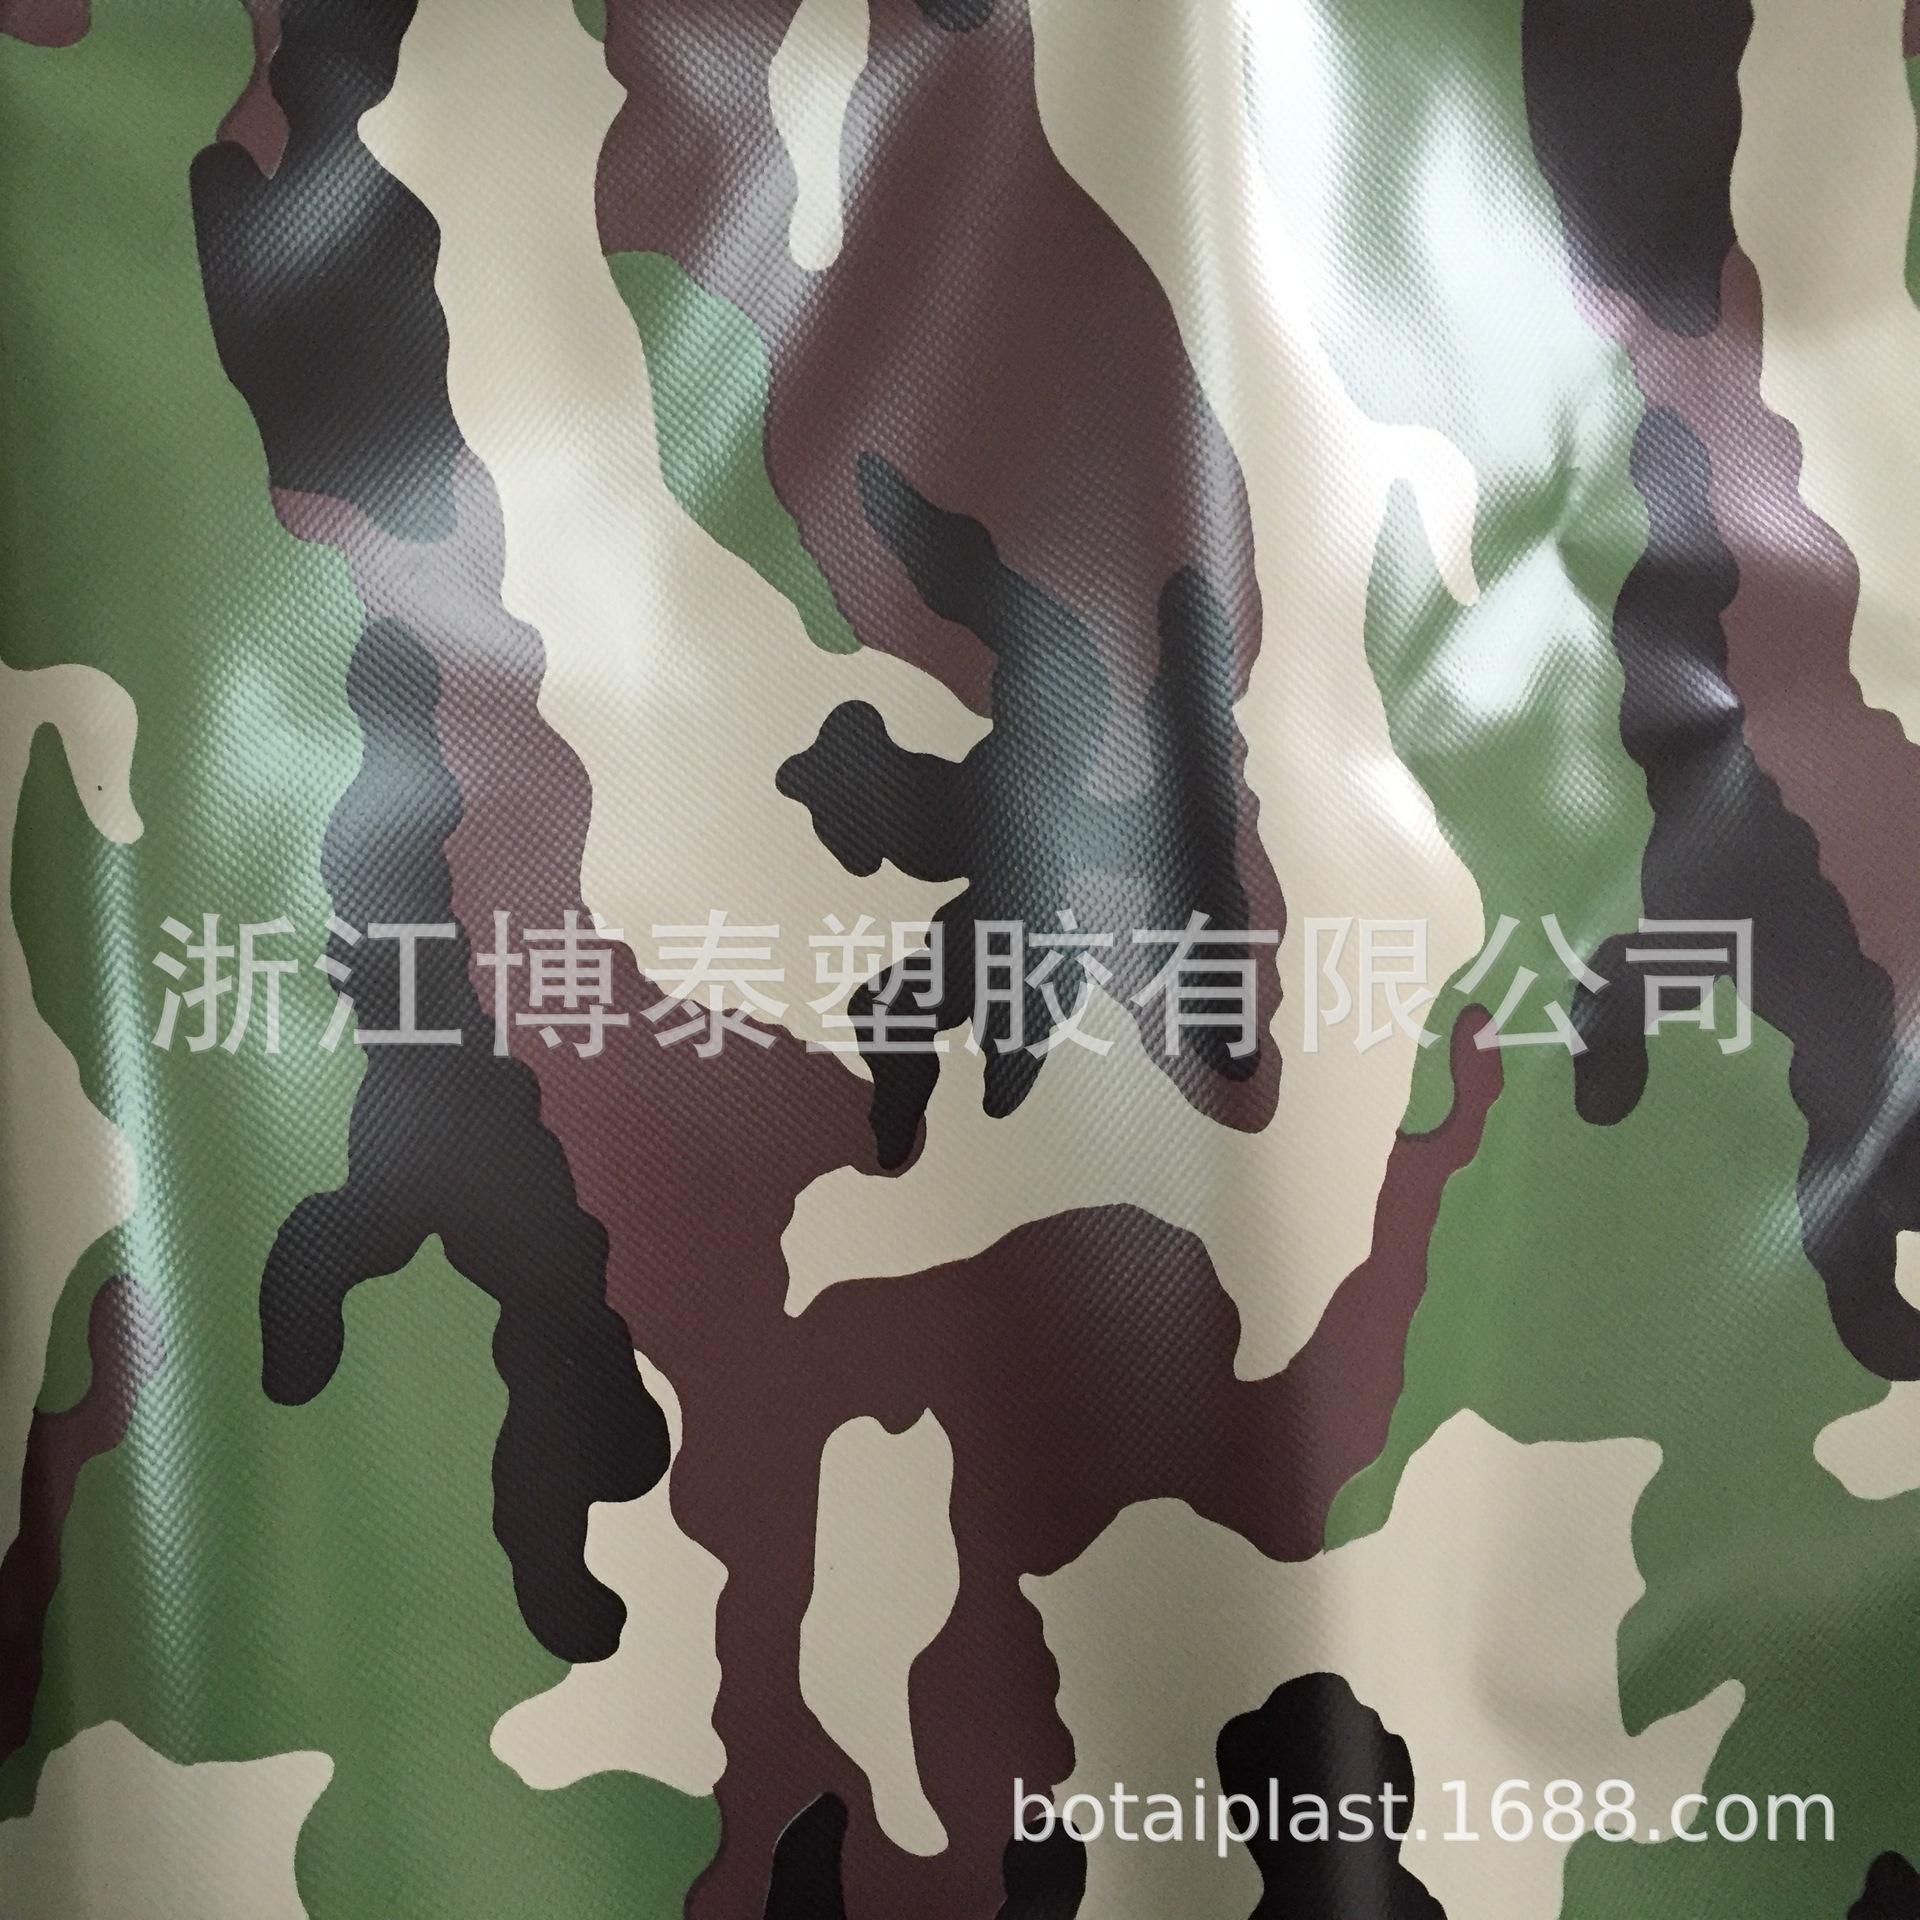 PVC夹网布 双面印刷迷彩花型 遮光遮阳PVC篷布夹网布迷彩PVC涂层